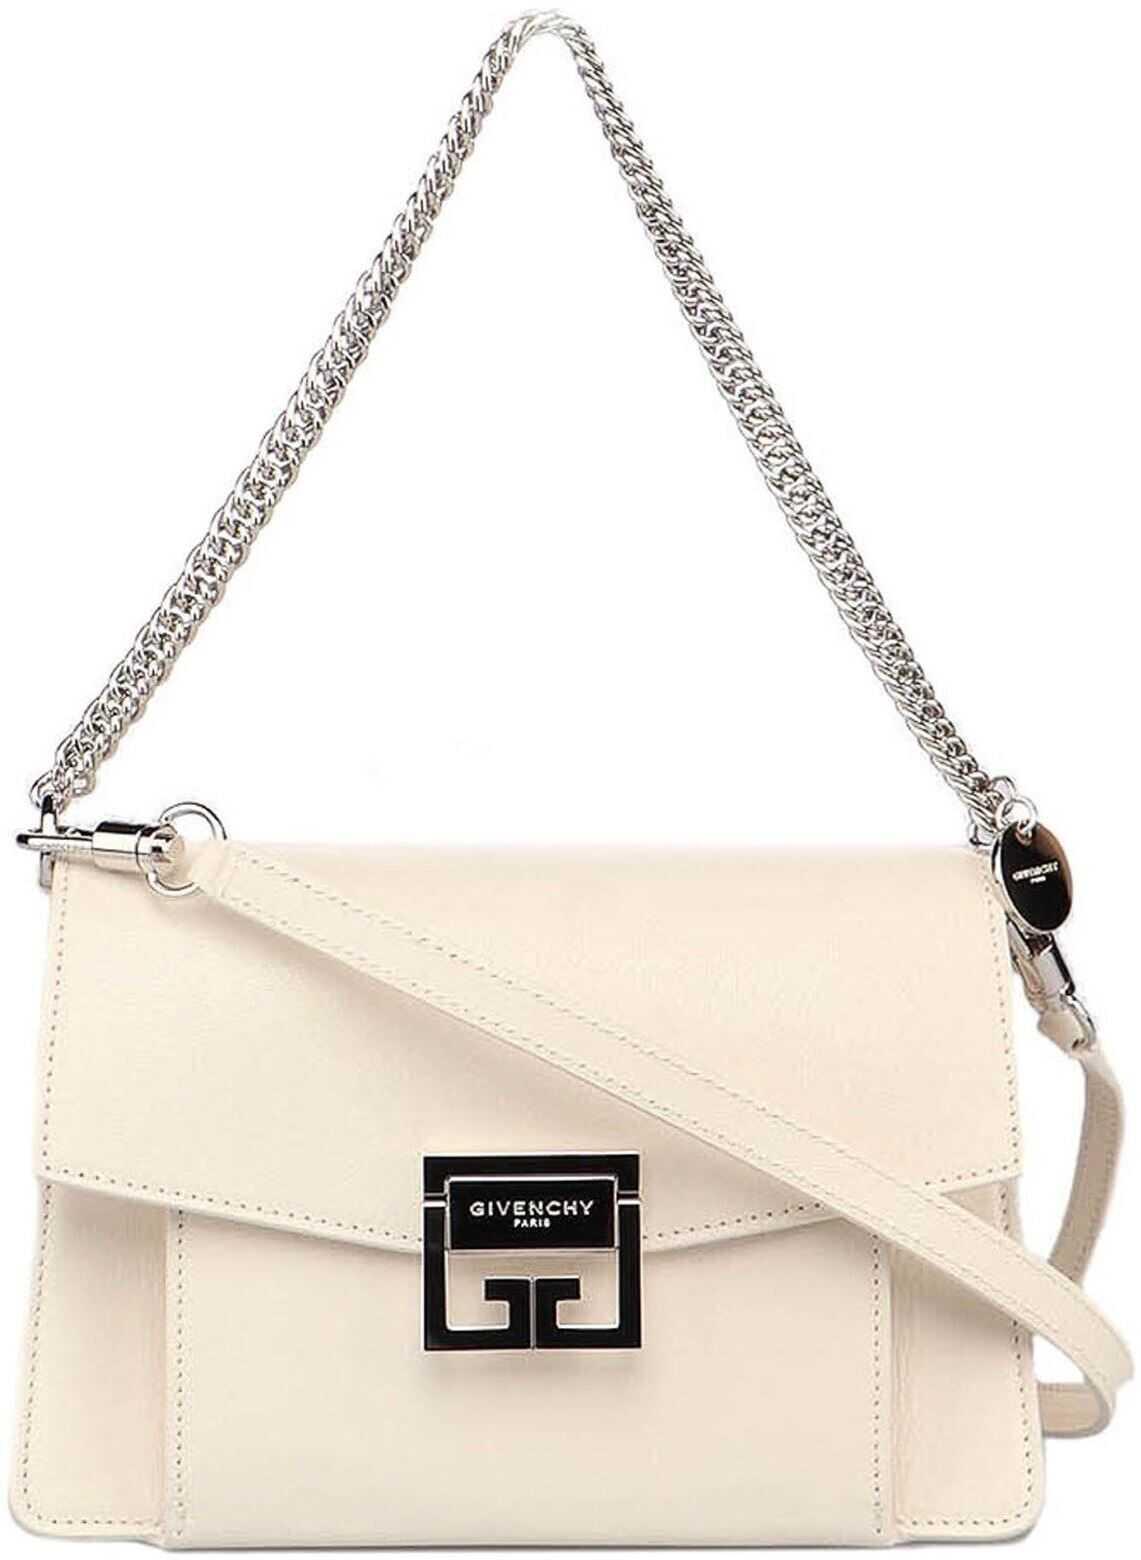 Givenchy Small Gv Bag BB501CB131105 White imagine b-mall.ro